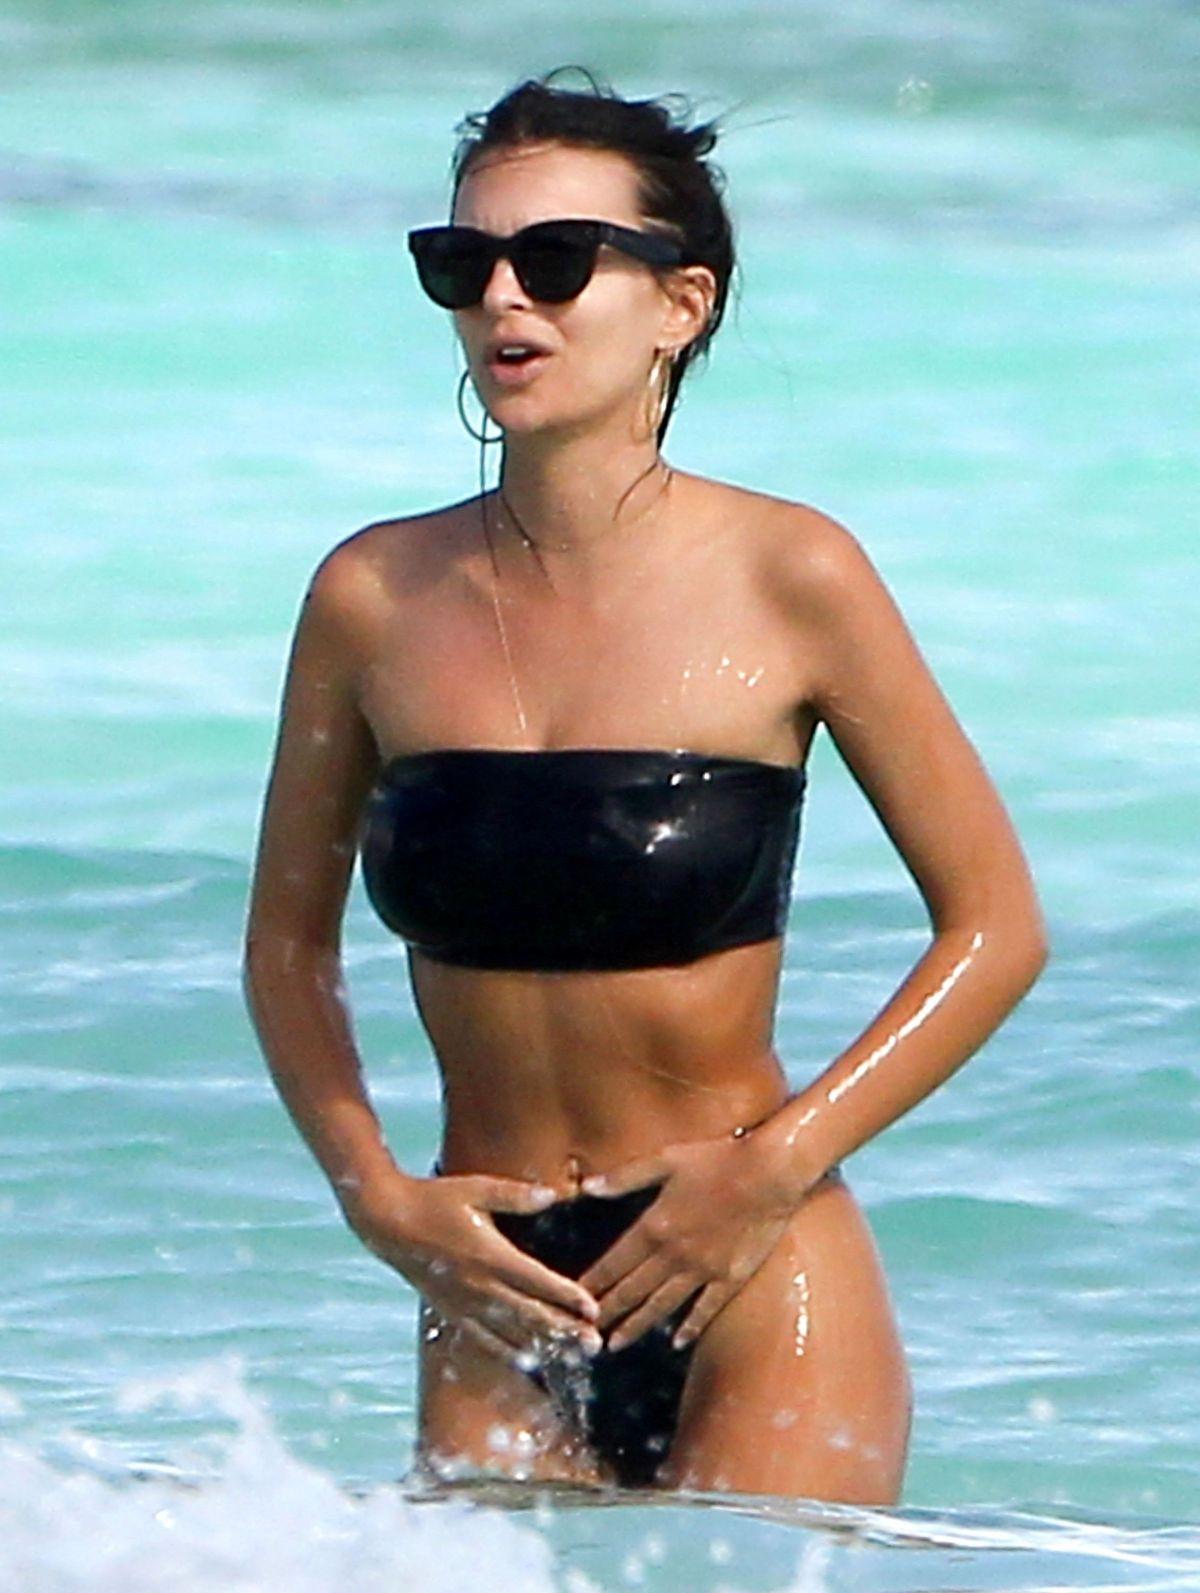 EMILY RATAJKOWSKI in Bikini on the Beach in Cancun 11/22/2016